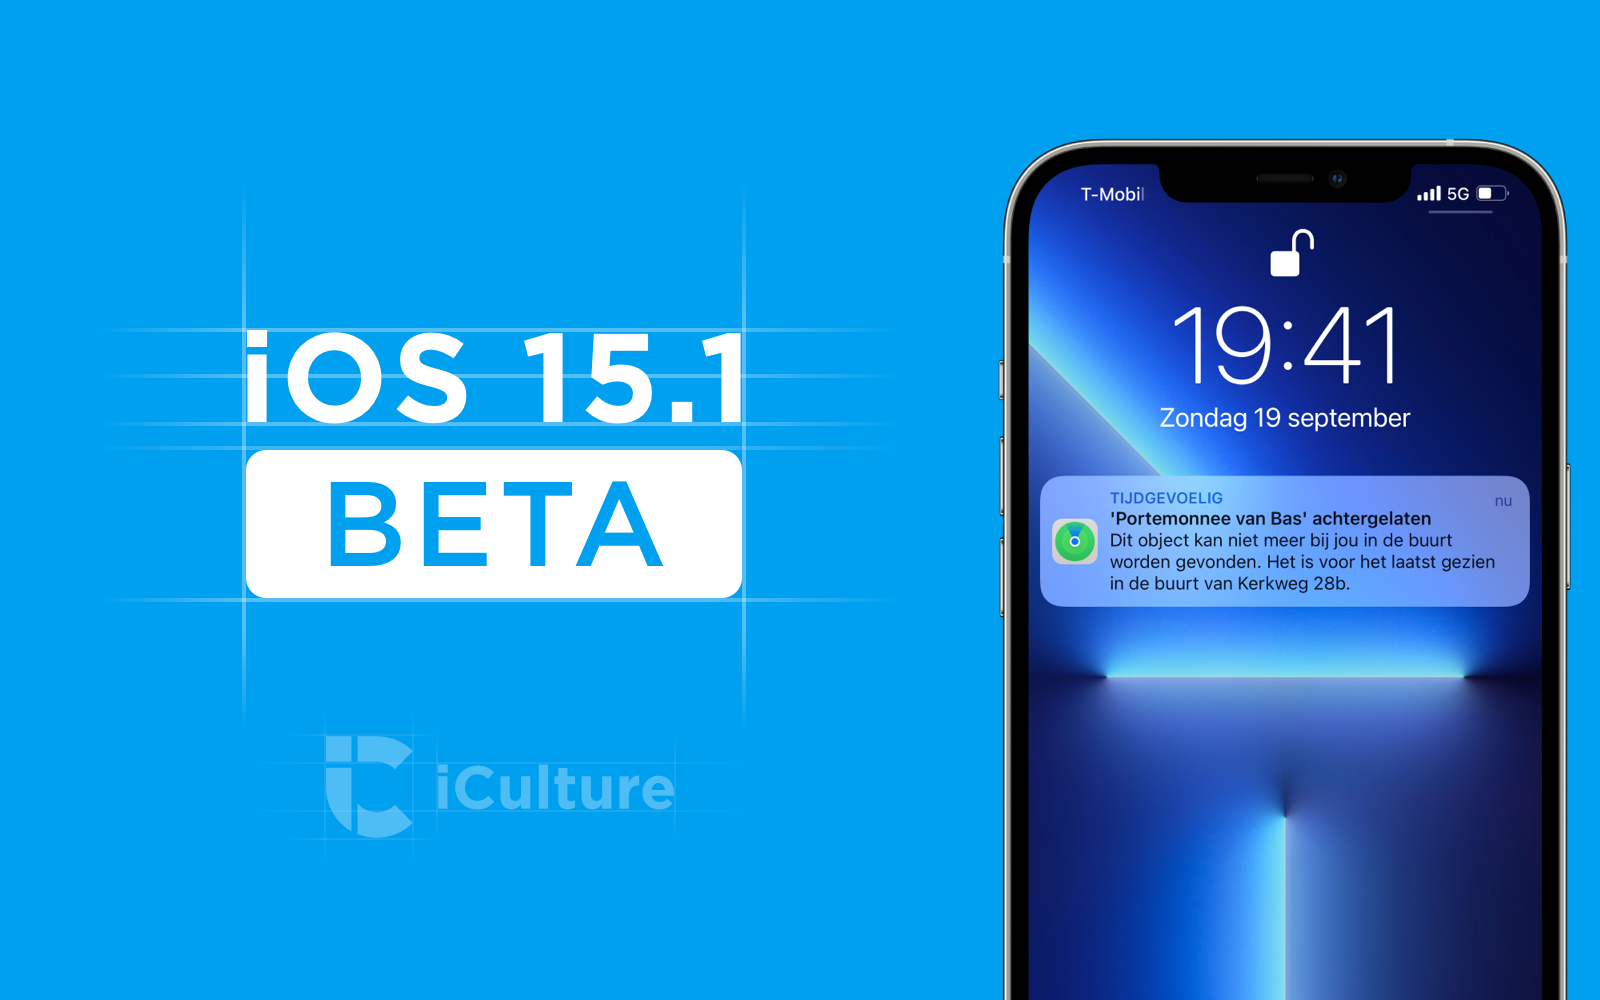 iOS 15.1 beta.